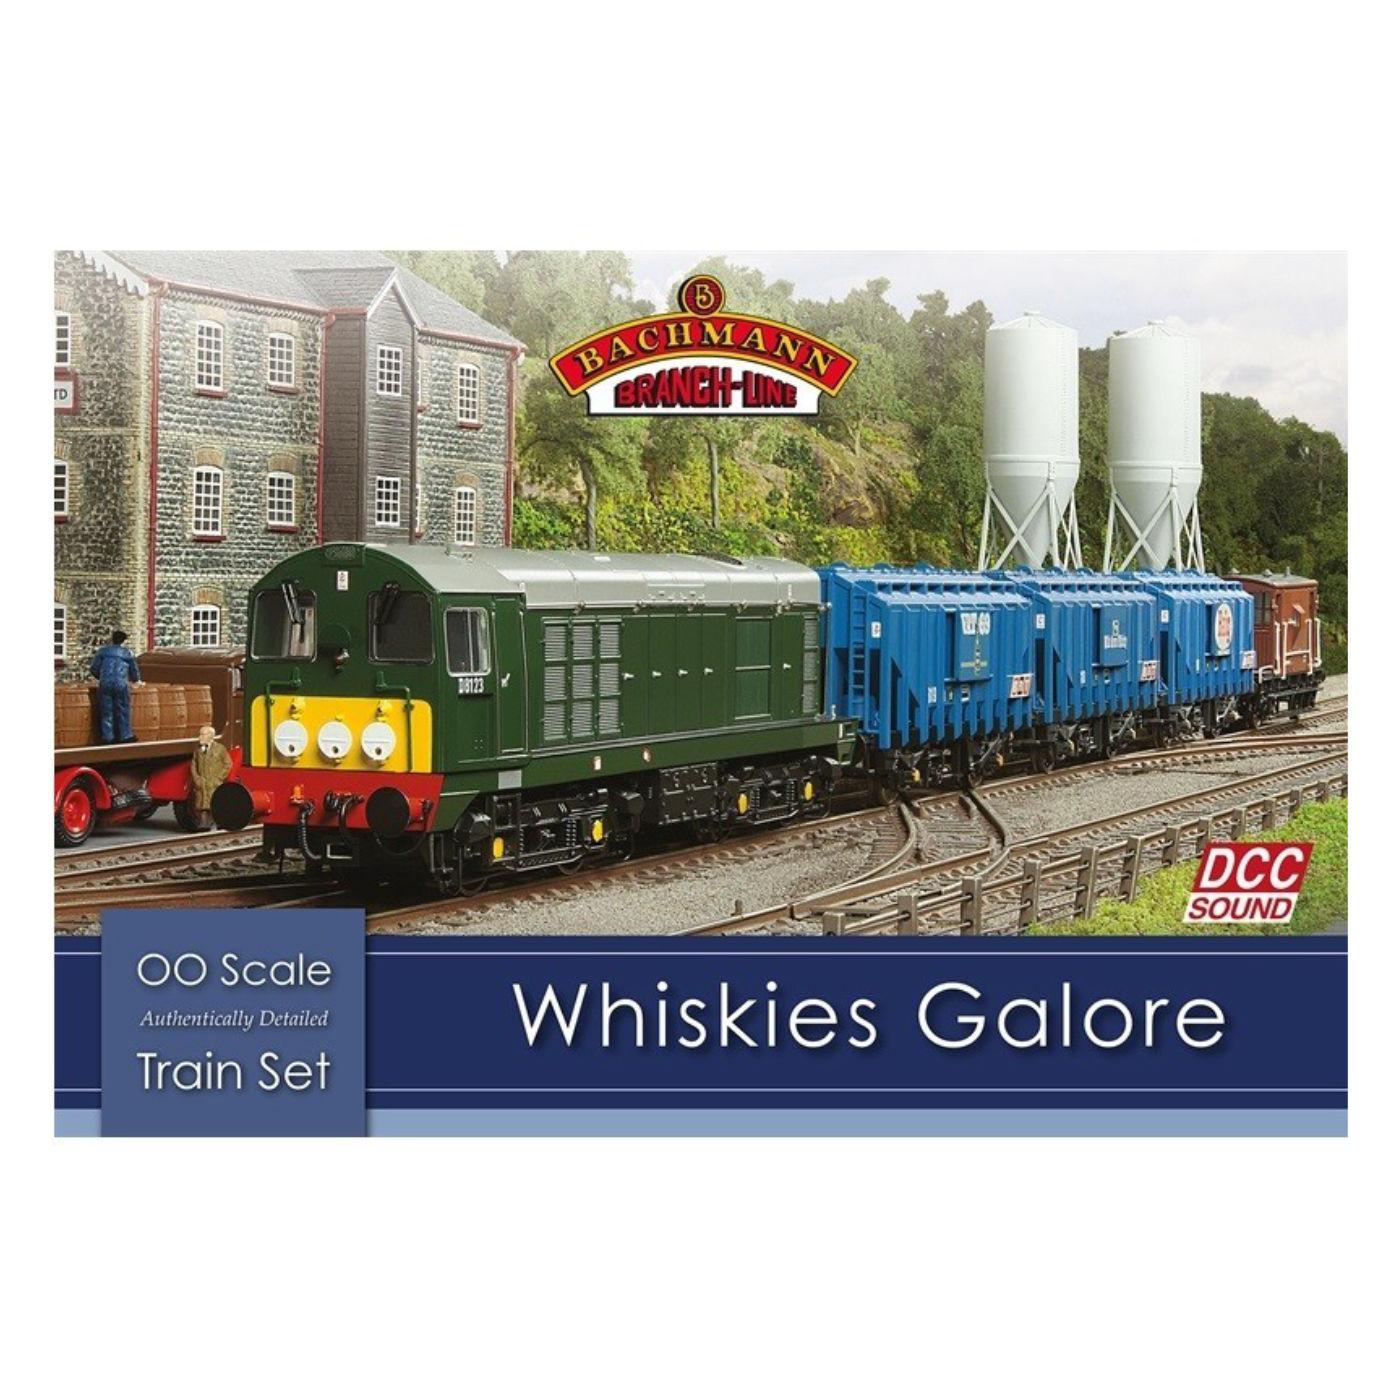 Whiskies Galore Train Set (R30-047)